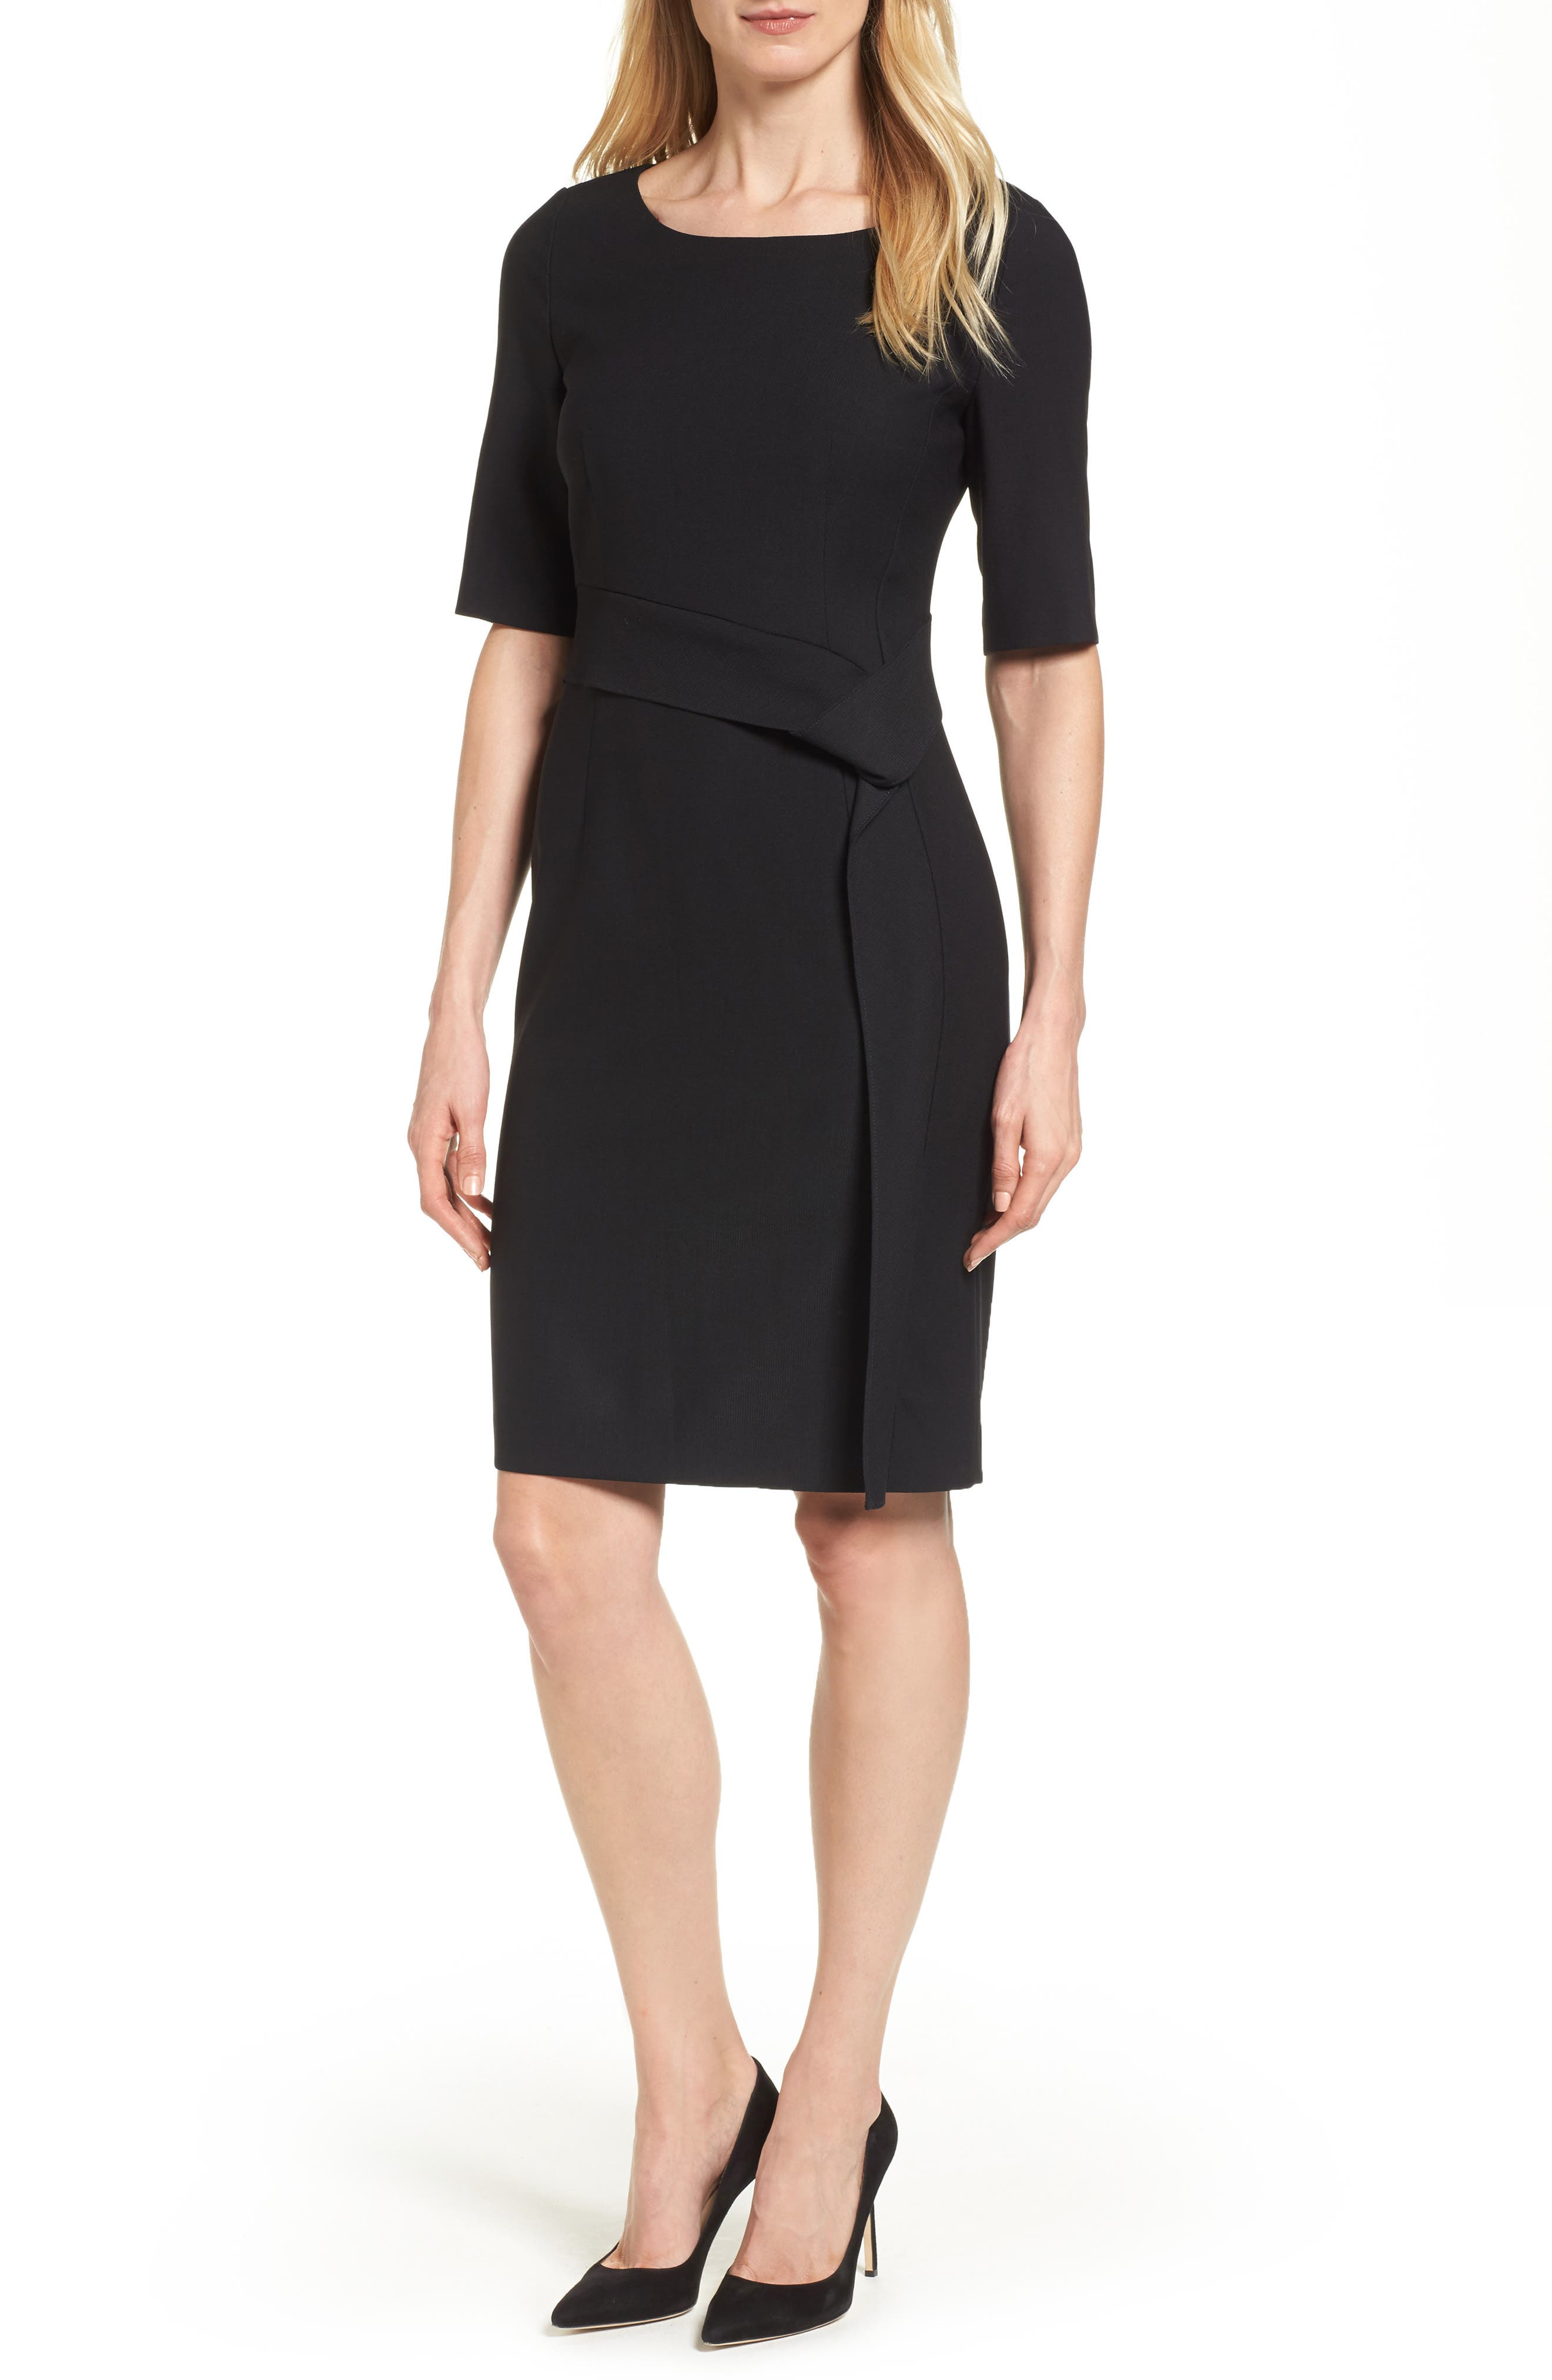 Delera Stretch Wool Sheath Dress,                         Main,                         color, Black